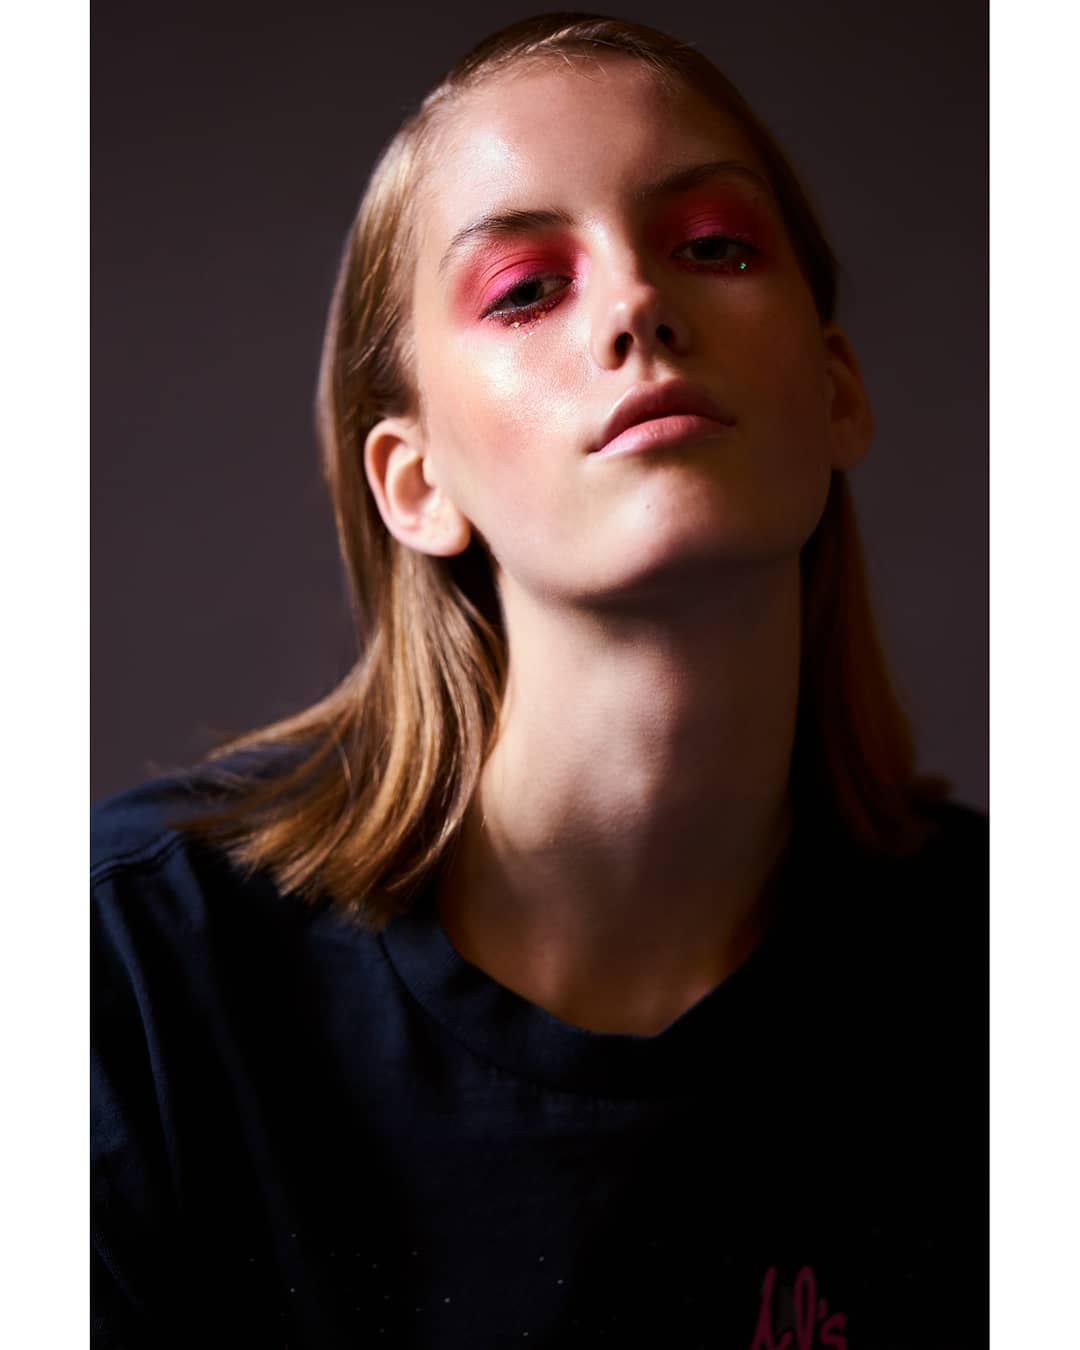 sonya7ii imgmodels wlyg beautyphotographer danmark dansk beautiful beauty makeup vintage MakeupArtist Model